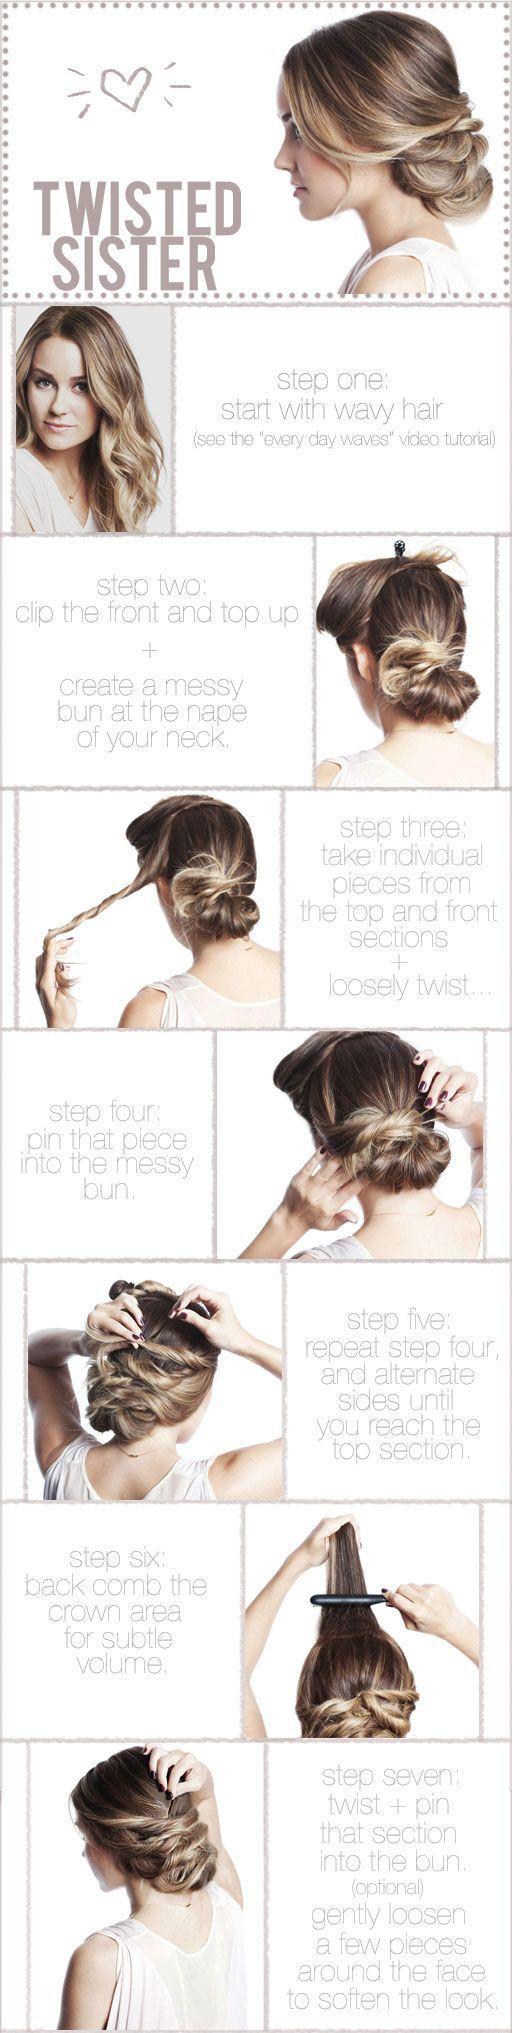 best peinados para la mujer images on pinterest floral hair